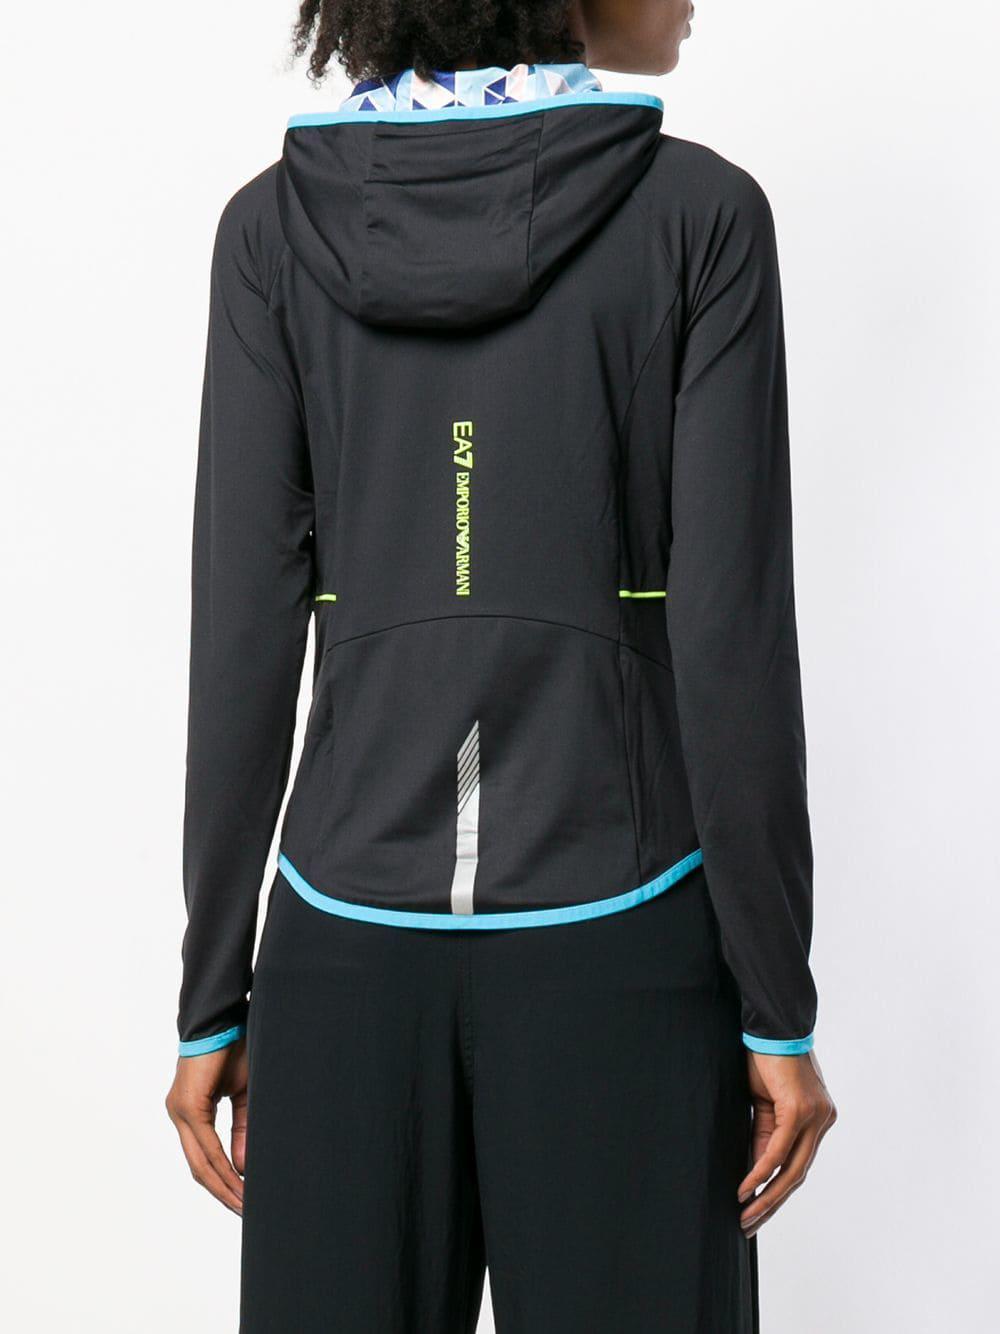 Lyst - Ea7 Hooded Zipped Cardigan in Black 0c62a539b2e